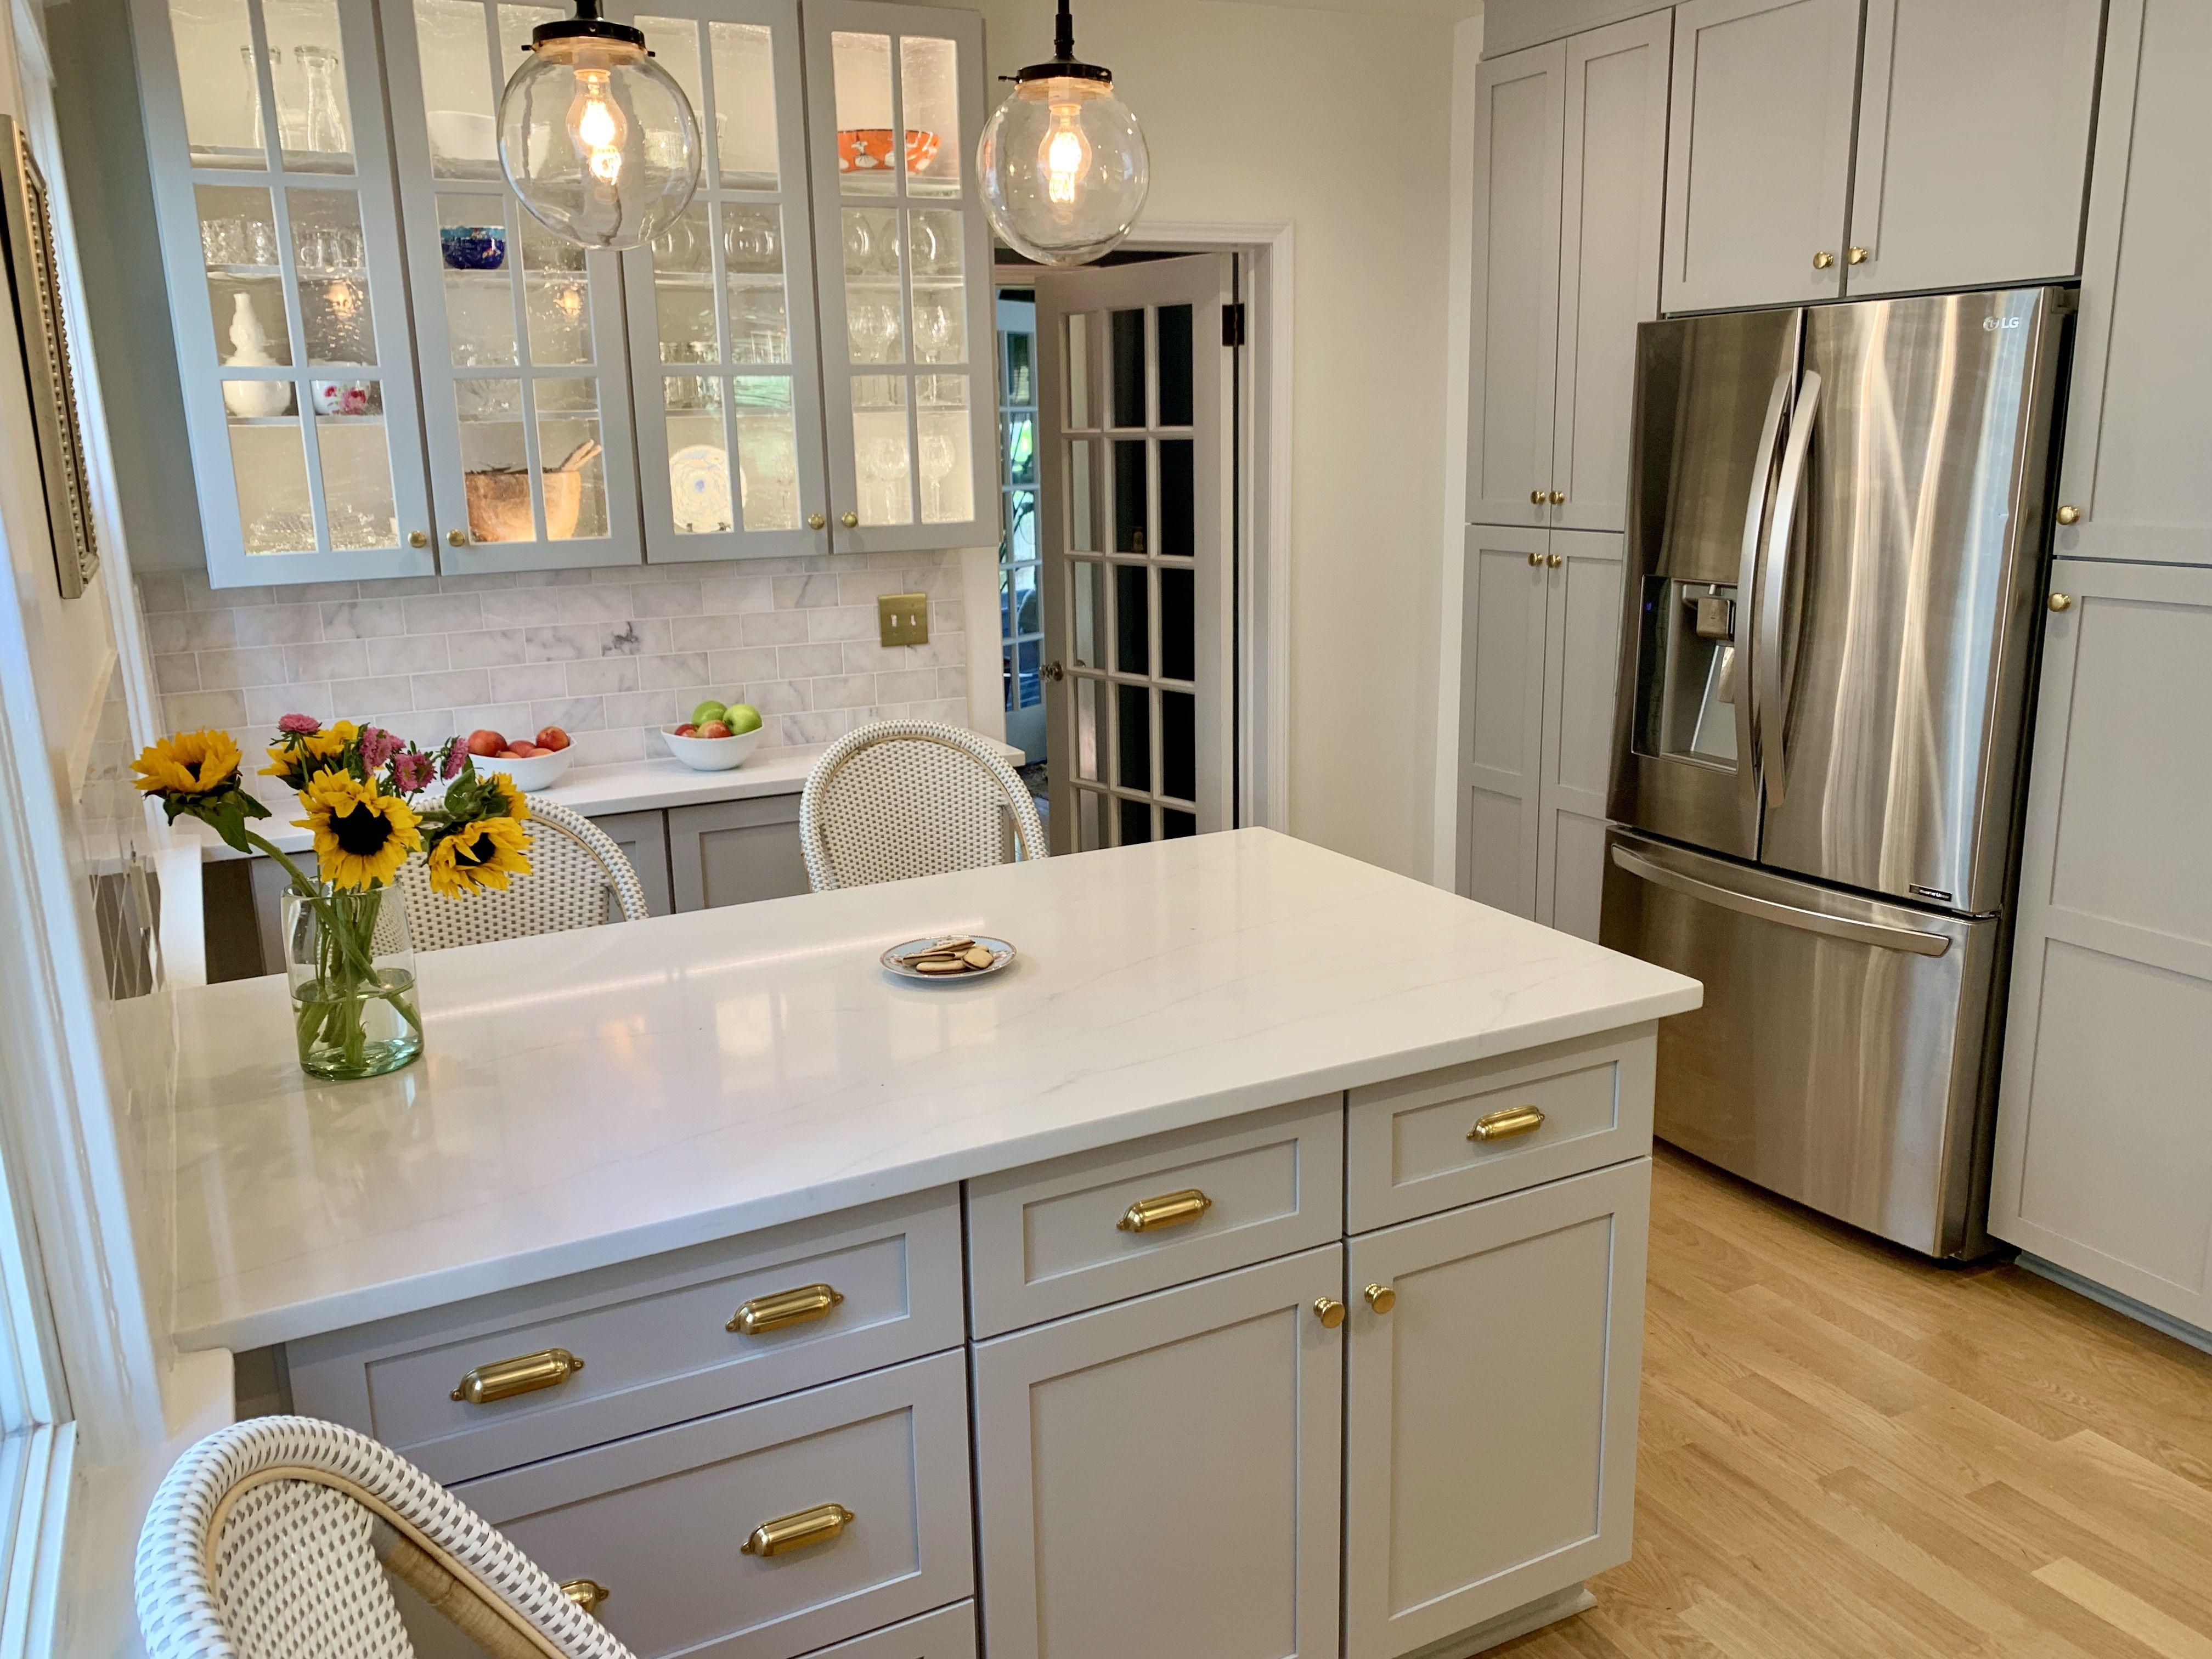 Kitchen Renovation Grey Painted Kitchen Kitchen Renovation Painted Kitchen Cabinets Colors